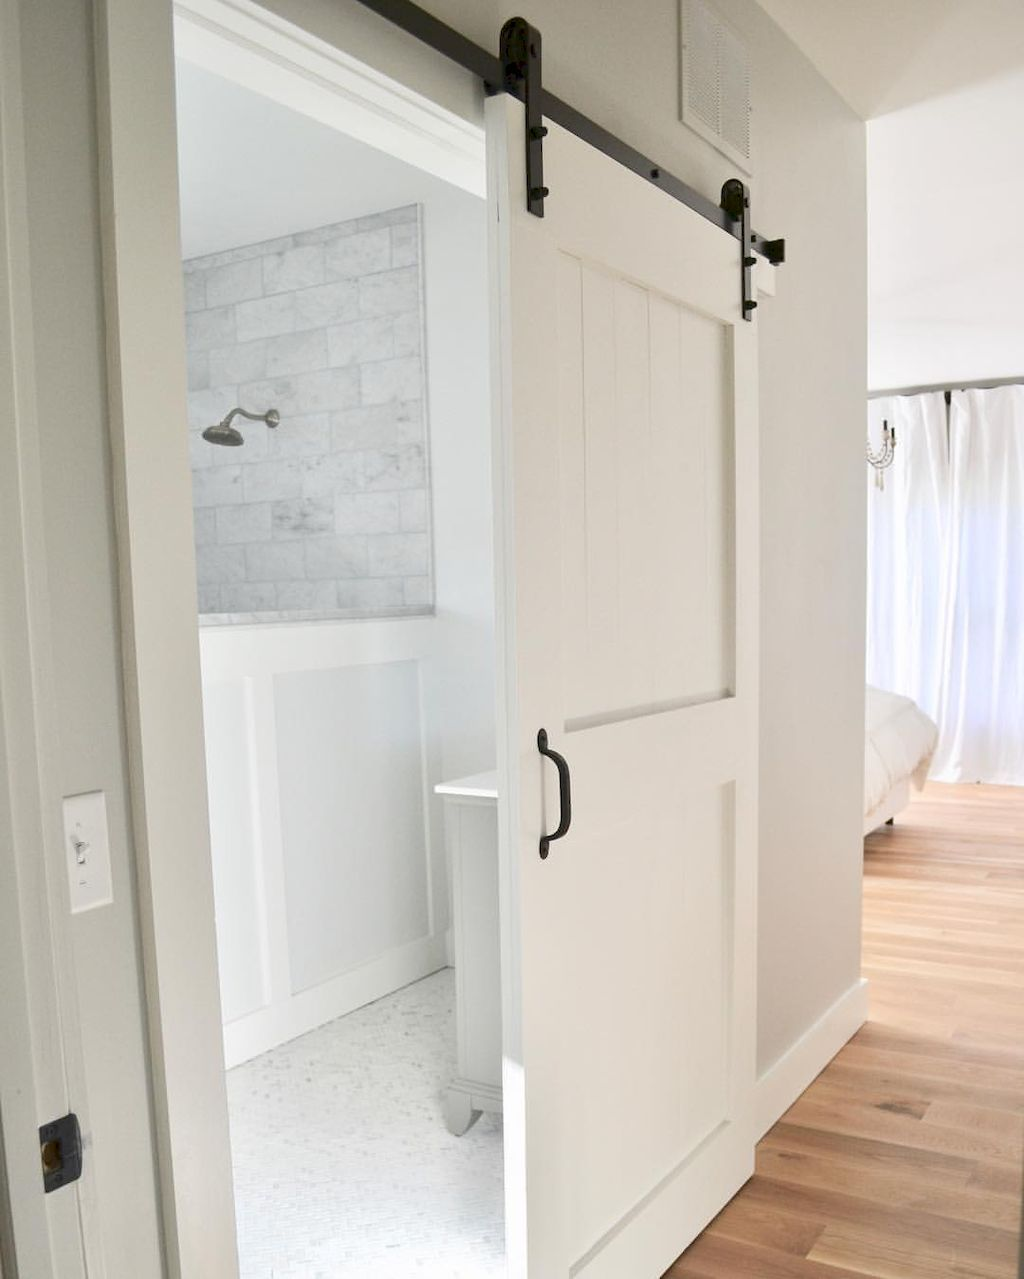 Rustic Small Bathroom Remodel Ideas 32 Small Bathroom Remodel White Barn Door Bathroom Barn Door